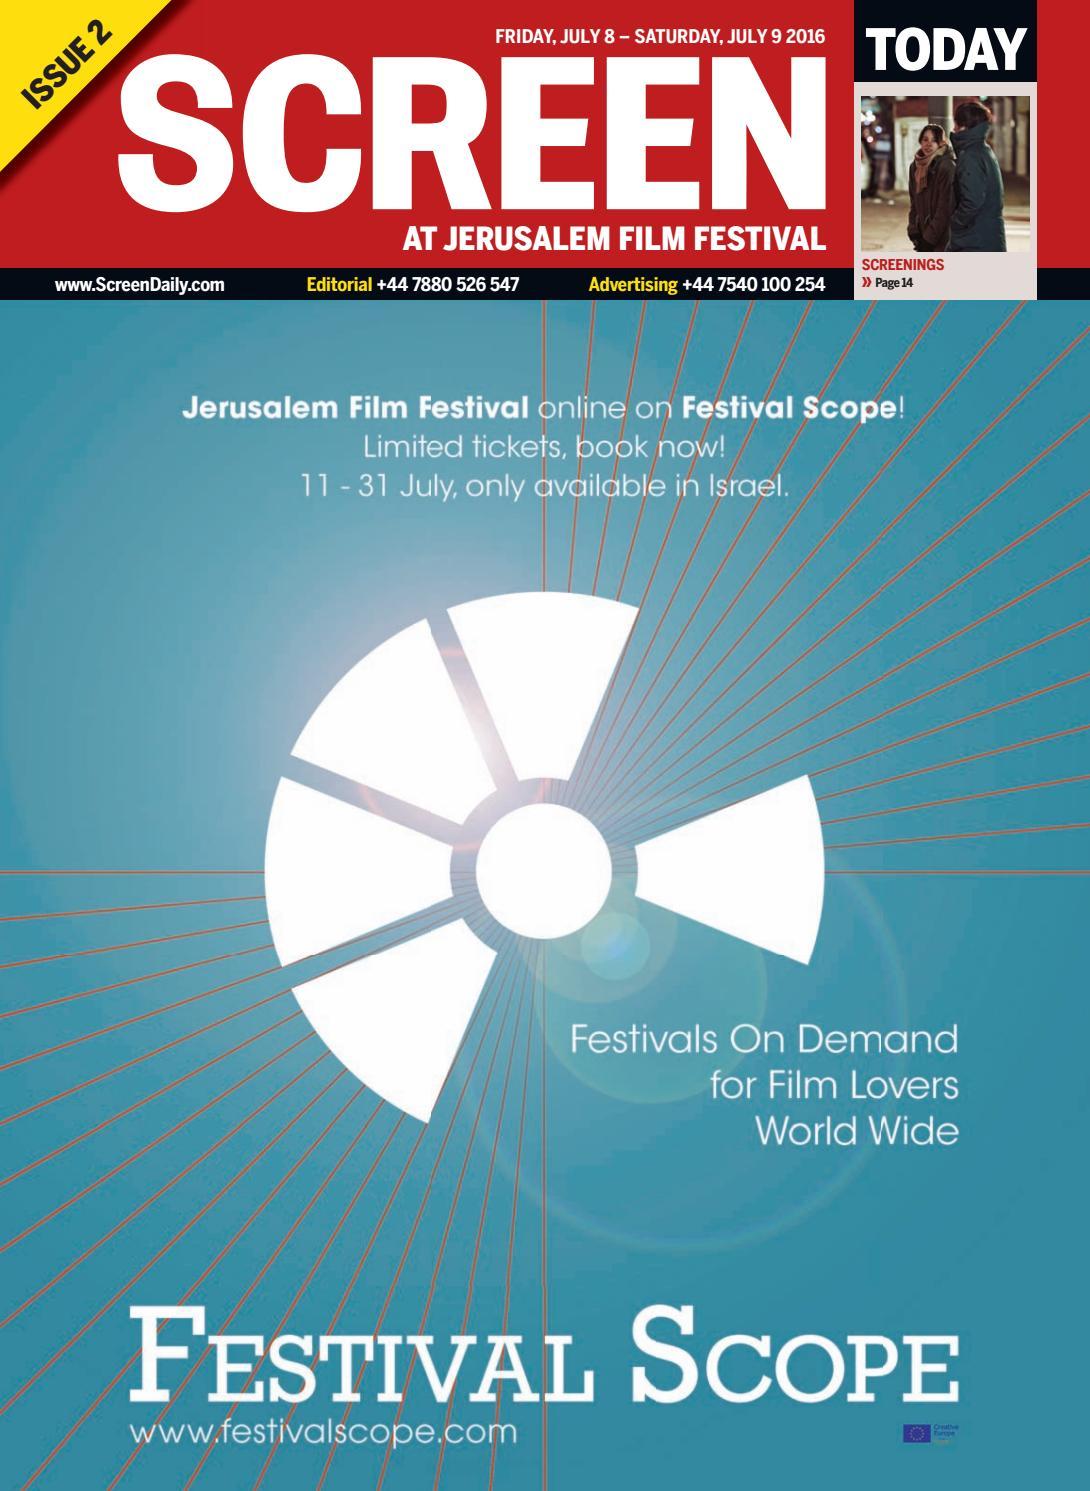 screen jeru m film festival 2016 day 3 by media business screen jeru m film festival 2016 day 2